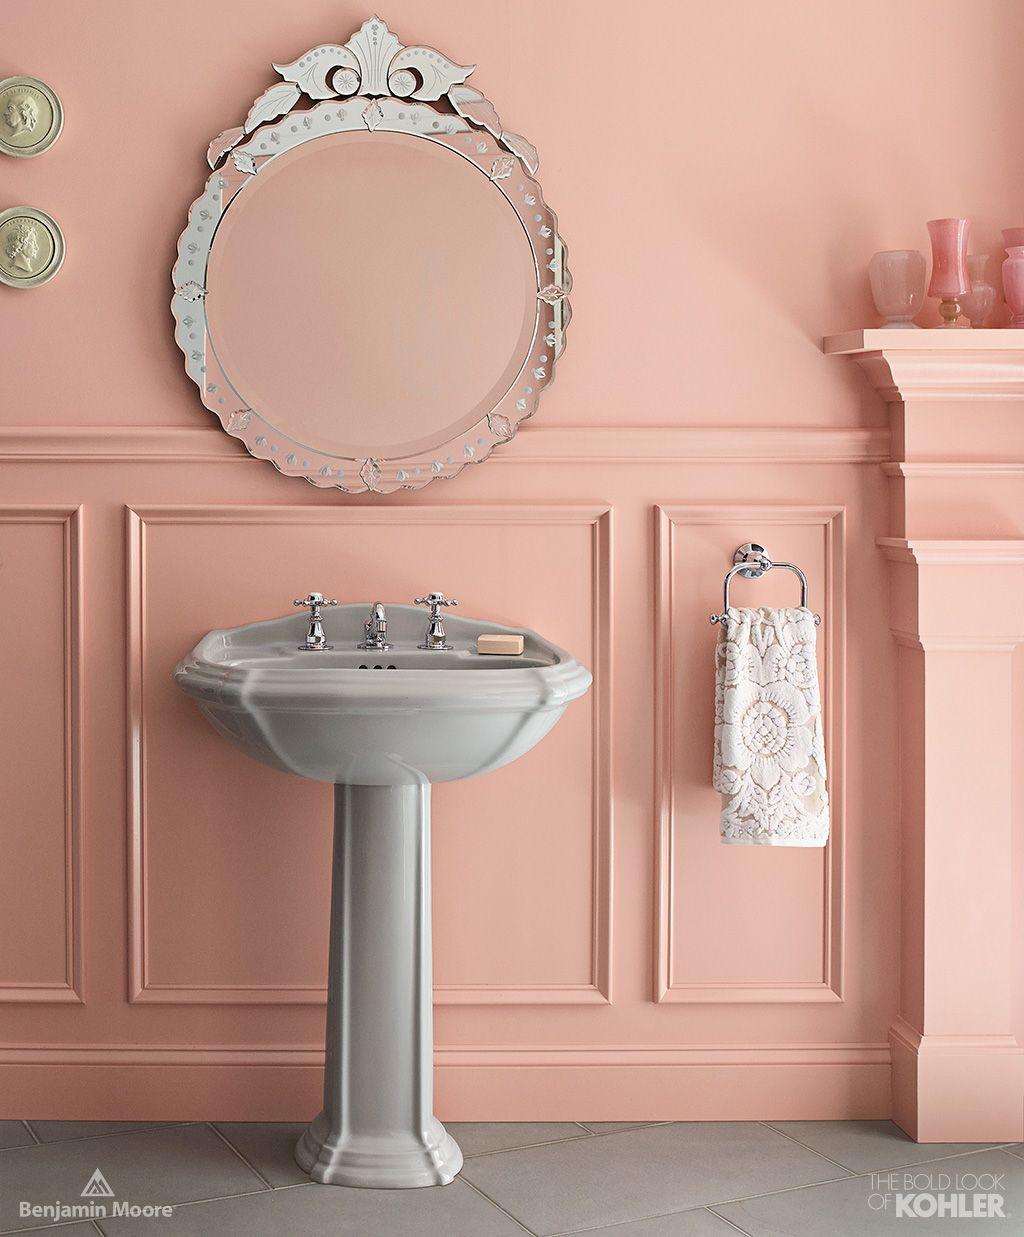 Home Ideas From KOHLER   Southern Charm Bathroom   Wall Color: Fruit Shake  Aura Bath